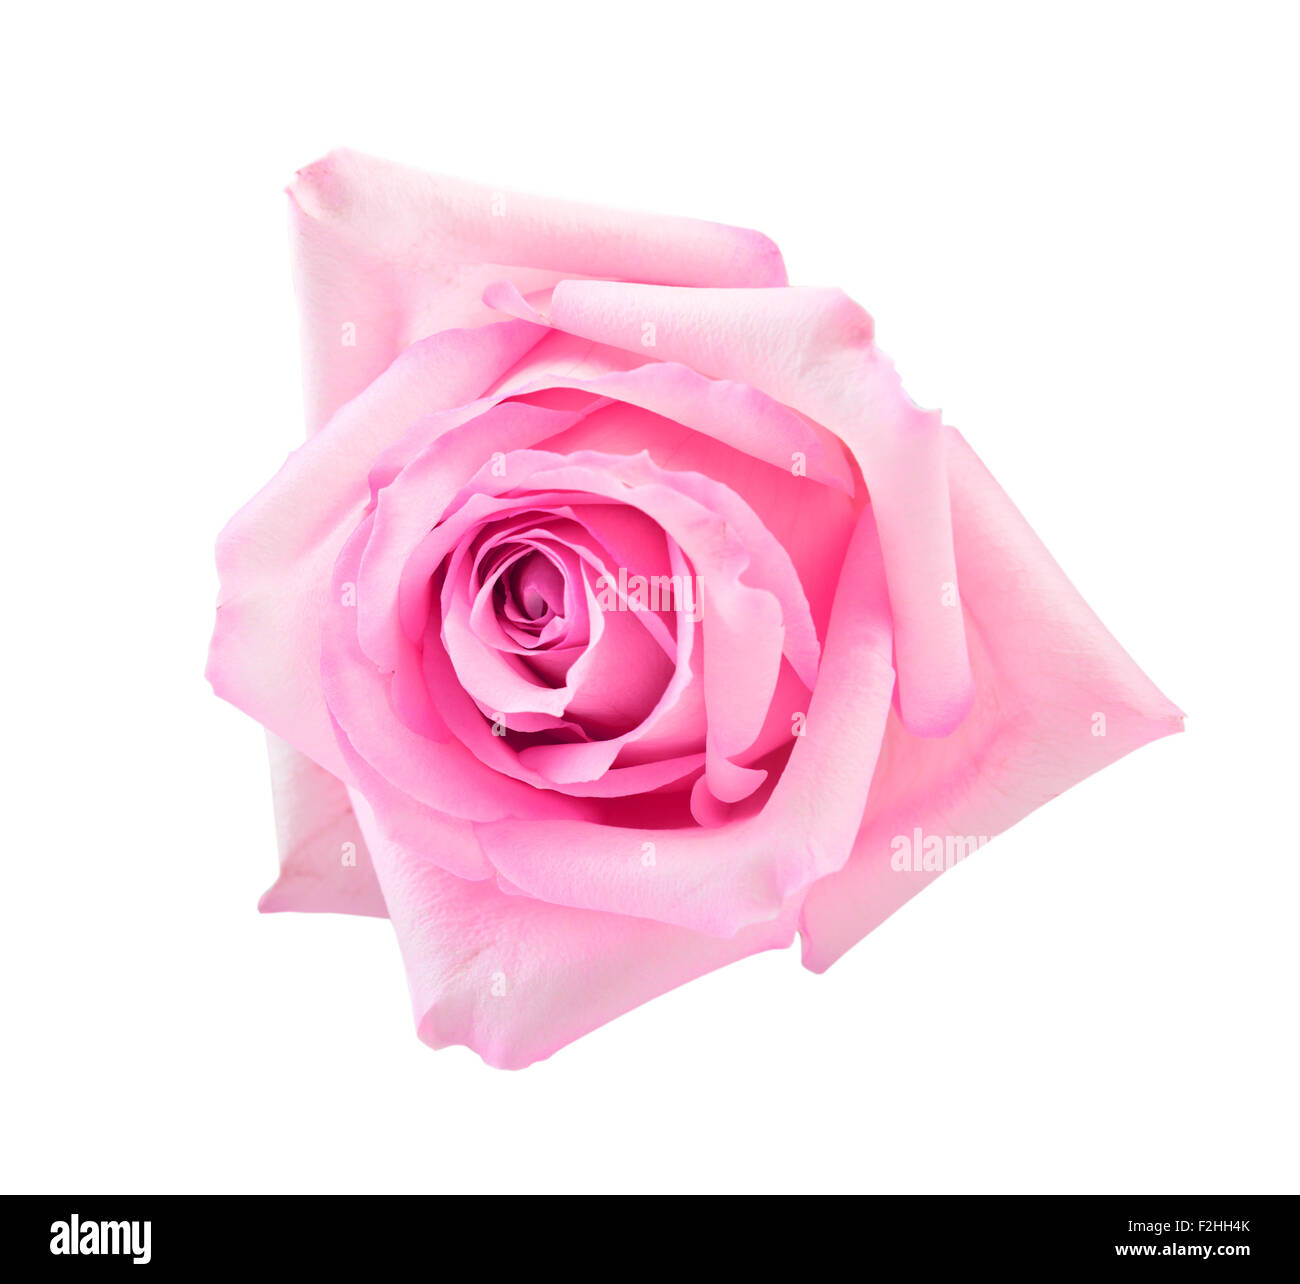 perfekt rosa Rose, isoliert auf weiss Stockbild